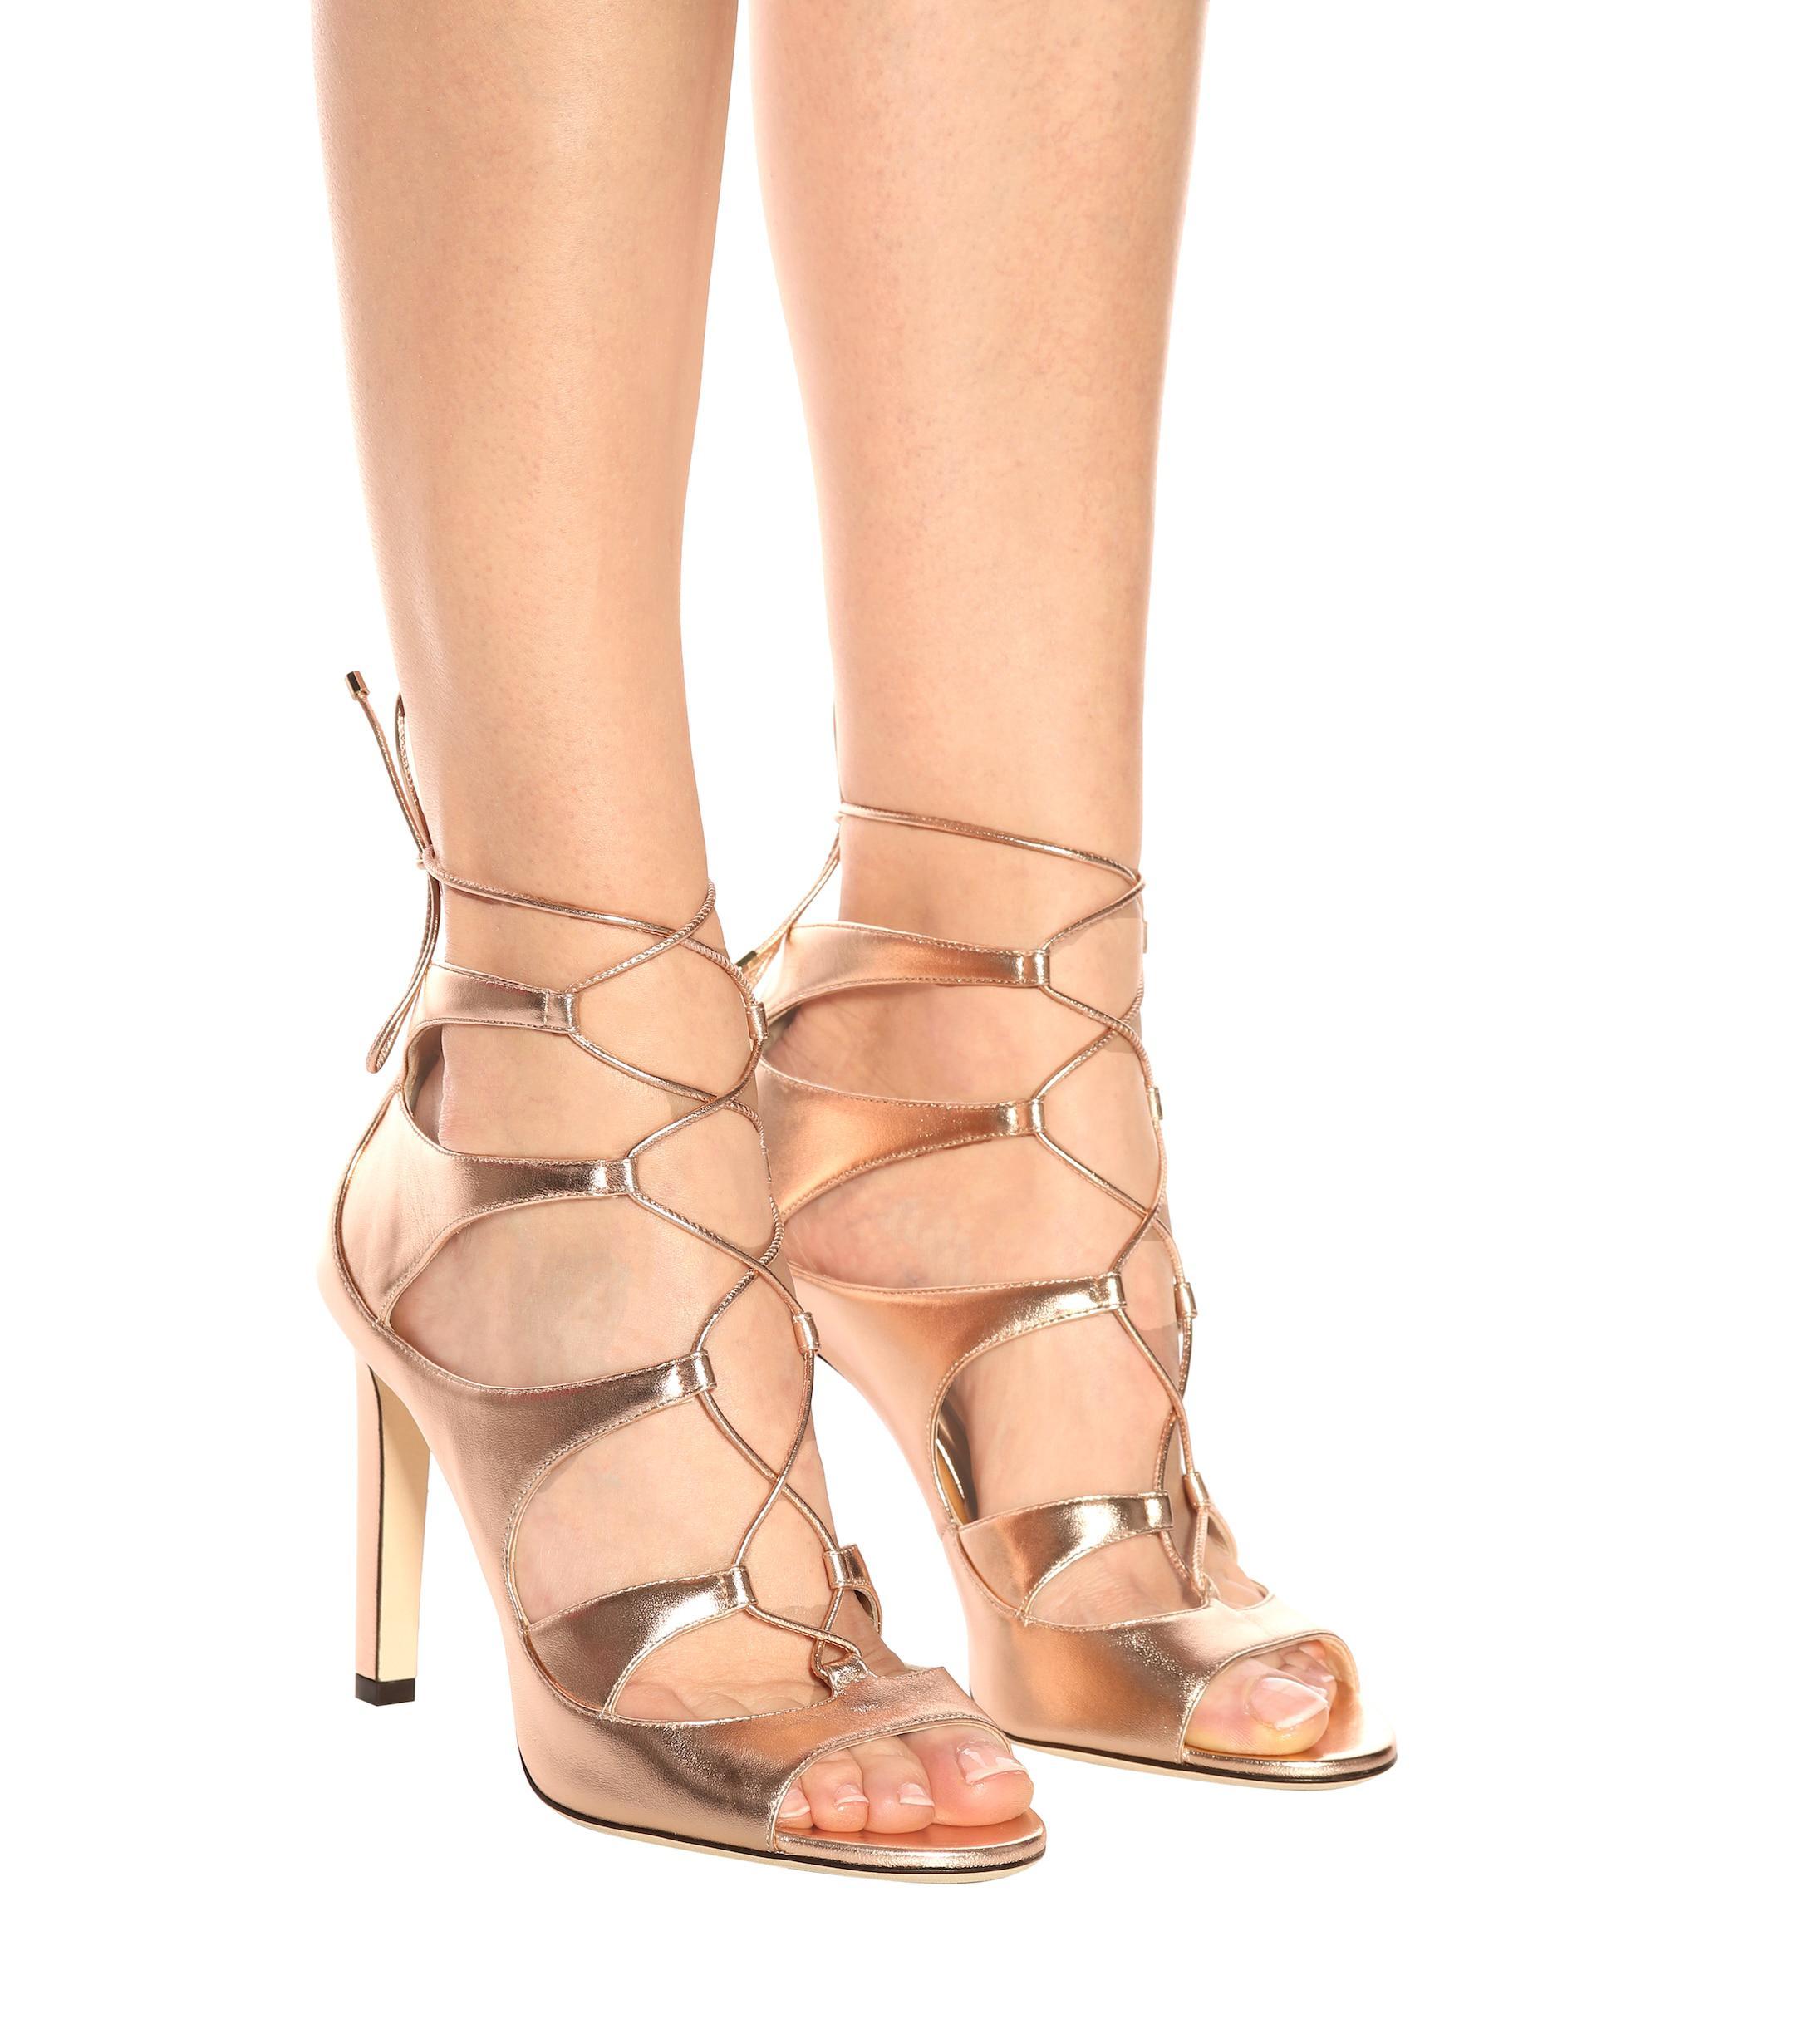 high heels andrew blake